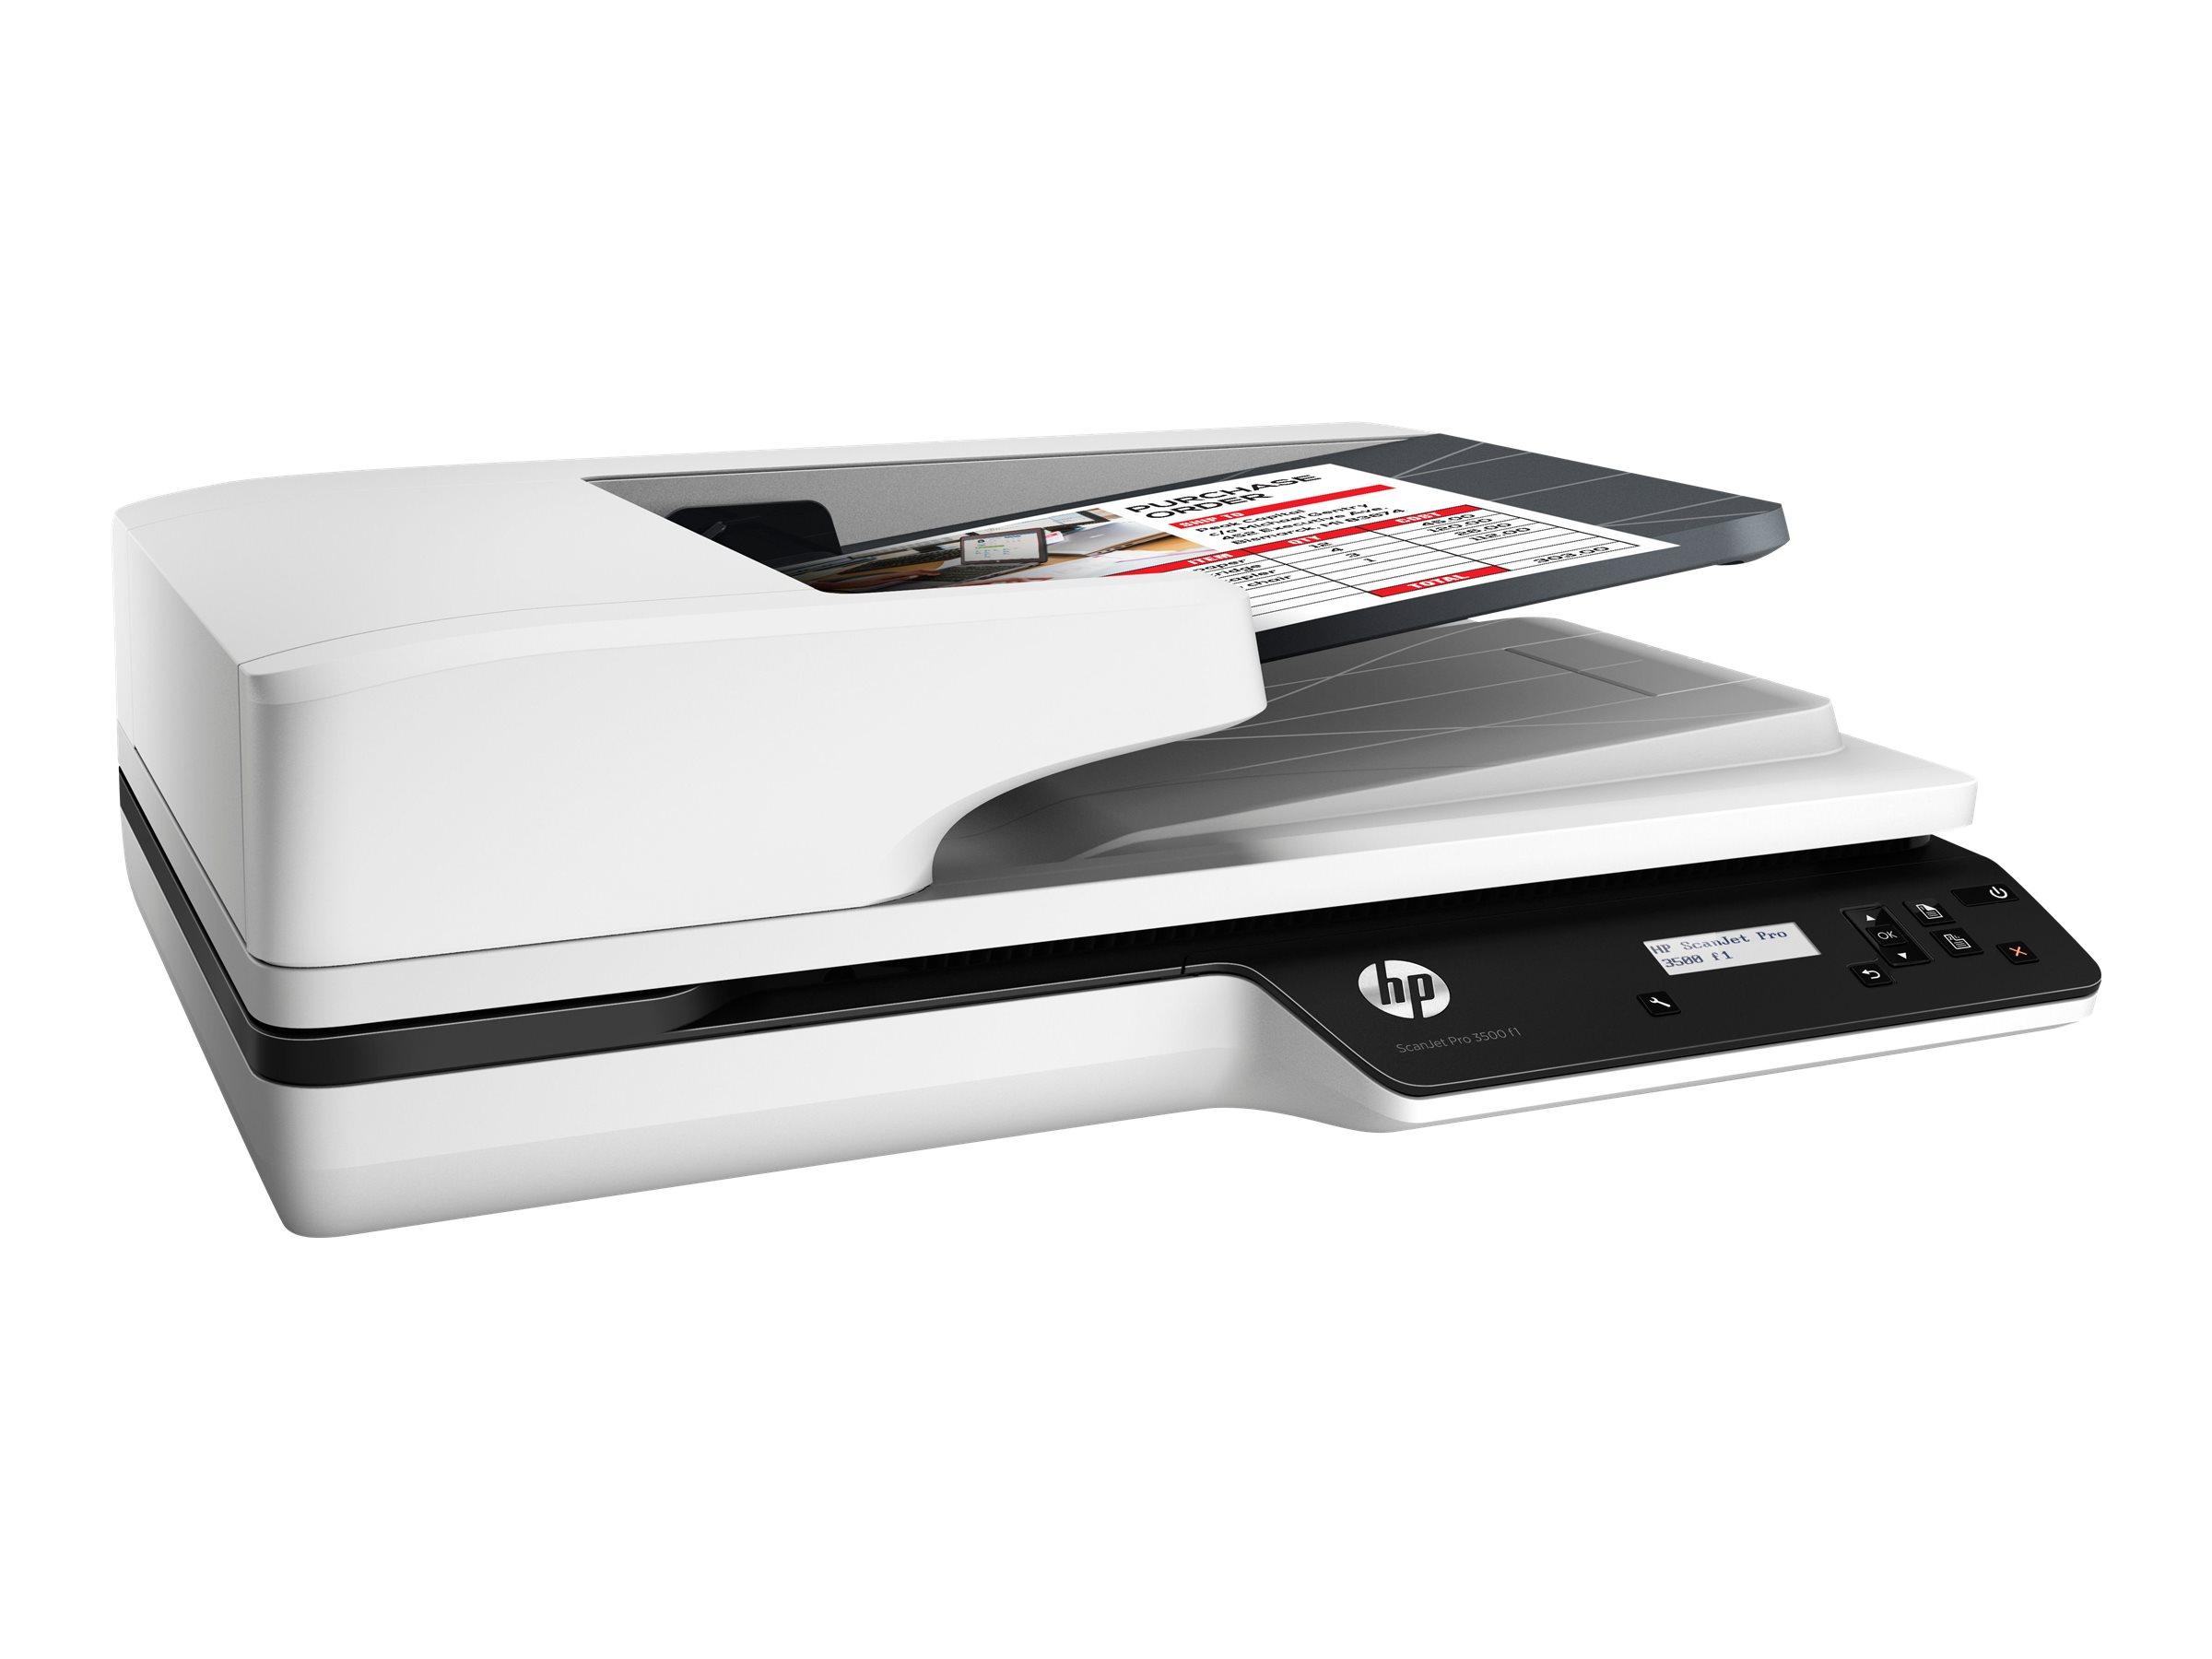 HP Scanjet Pro 3500 f1 - Dokumentenscanner